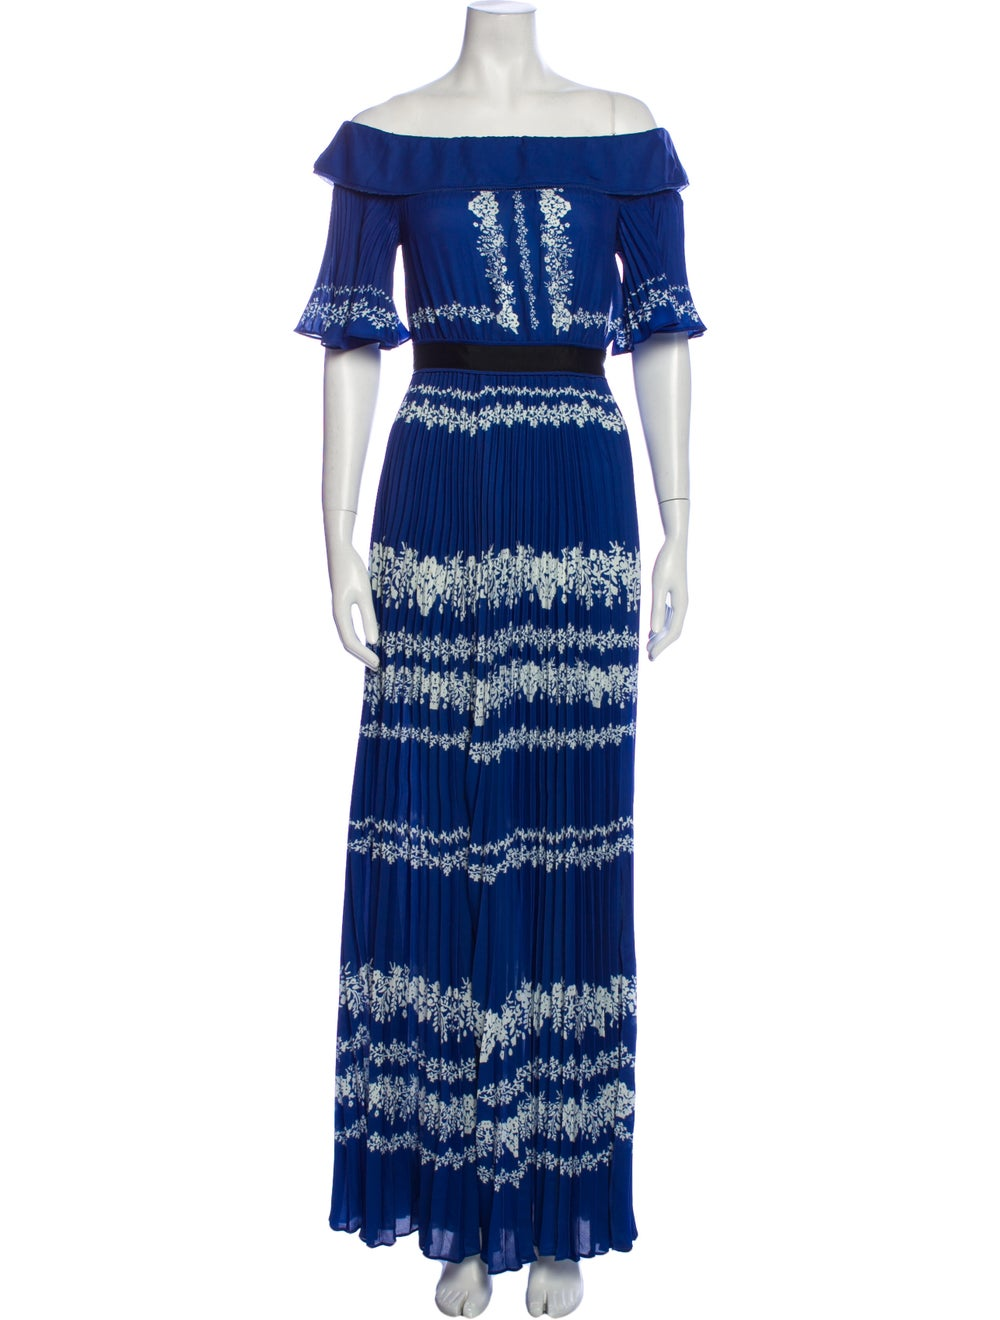 Self-Portrait Printed Long Dress Blue - image 1